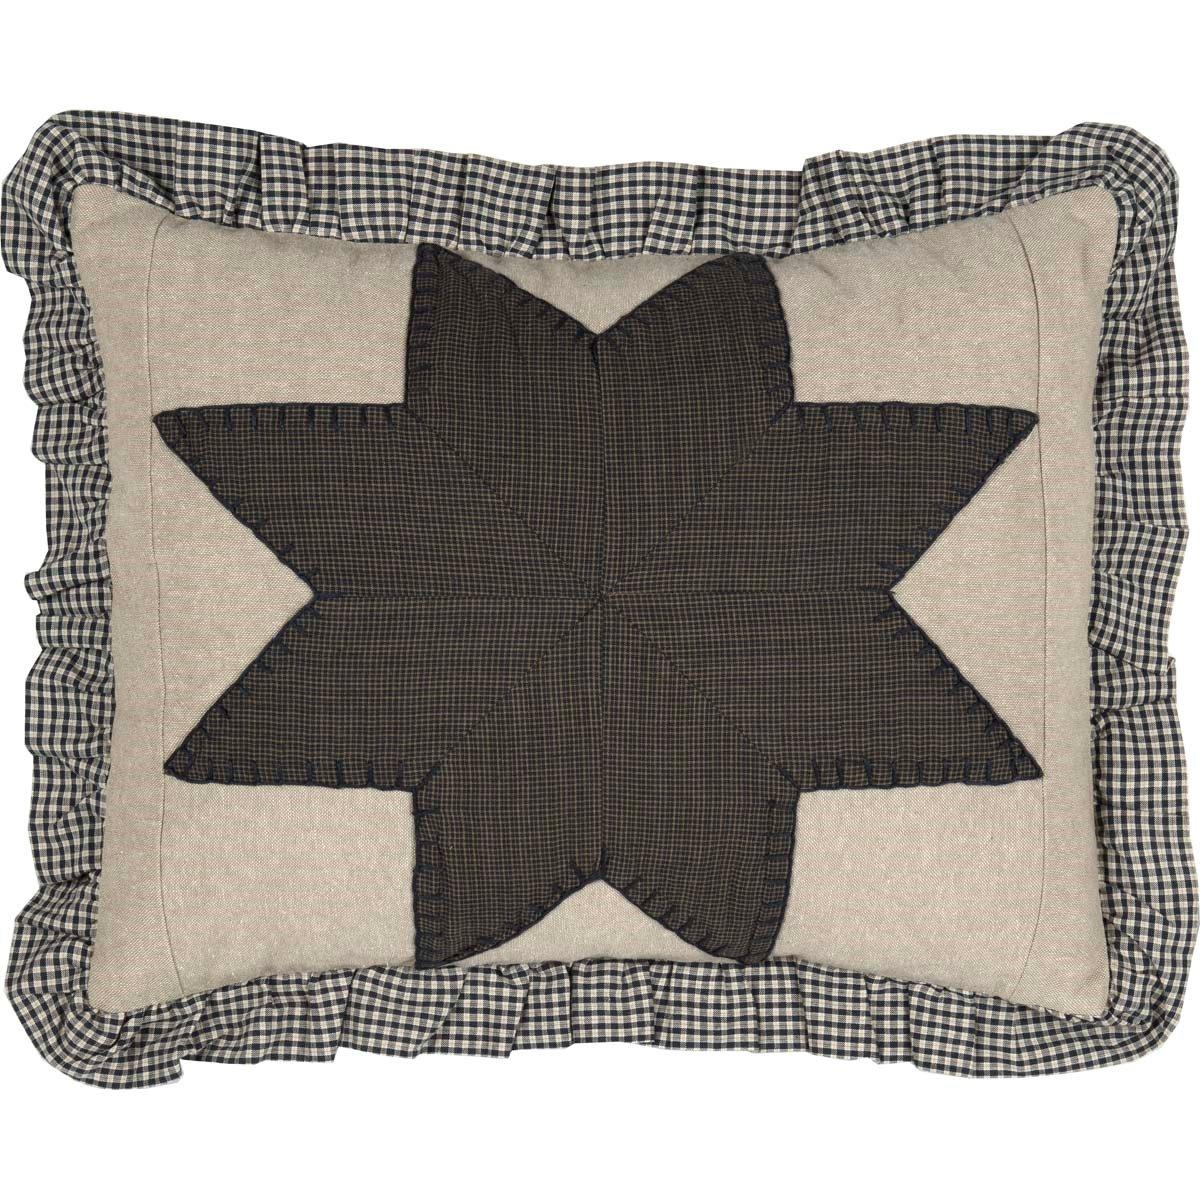 Liberty Stars Patchwork Pillow 14 x 18